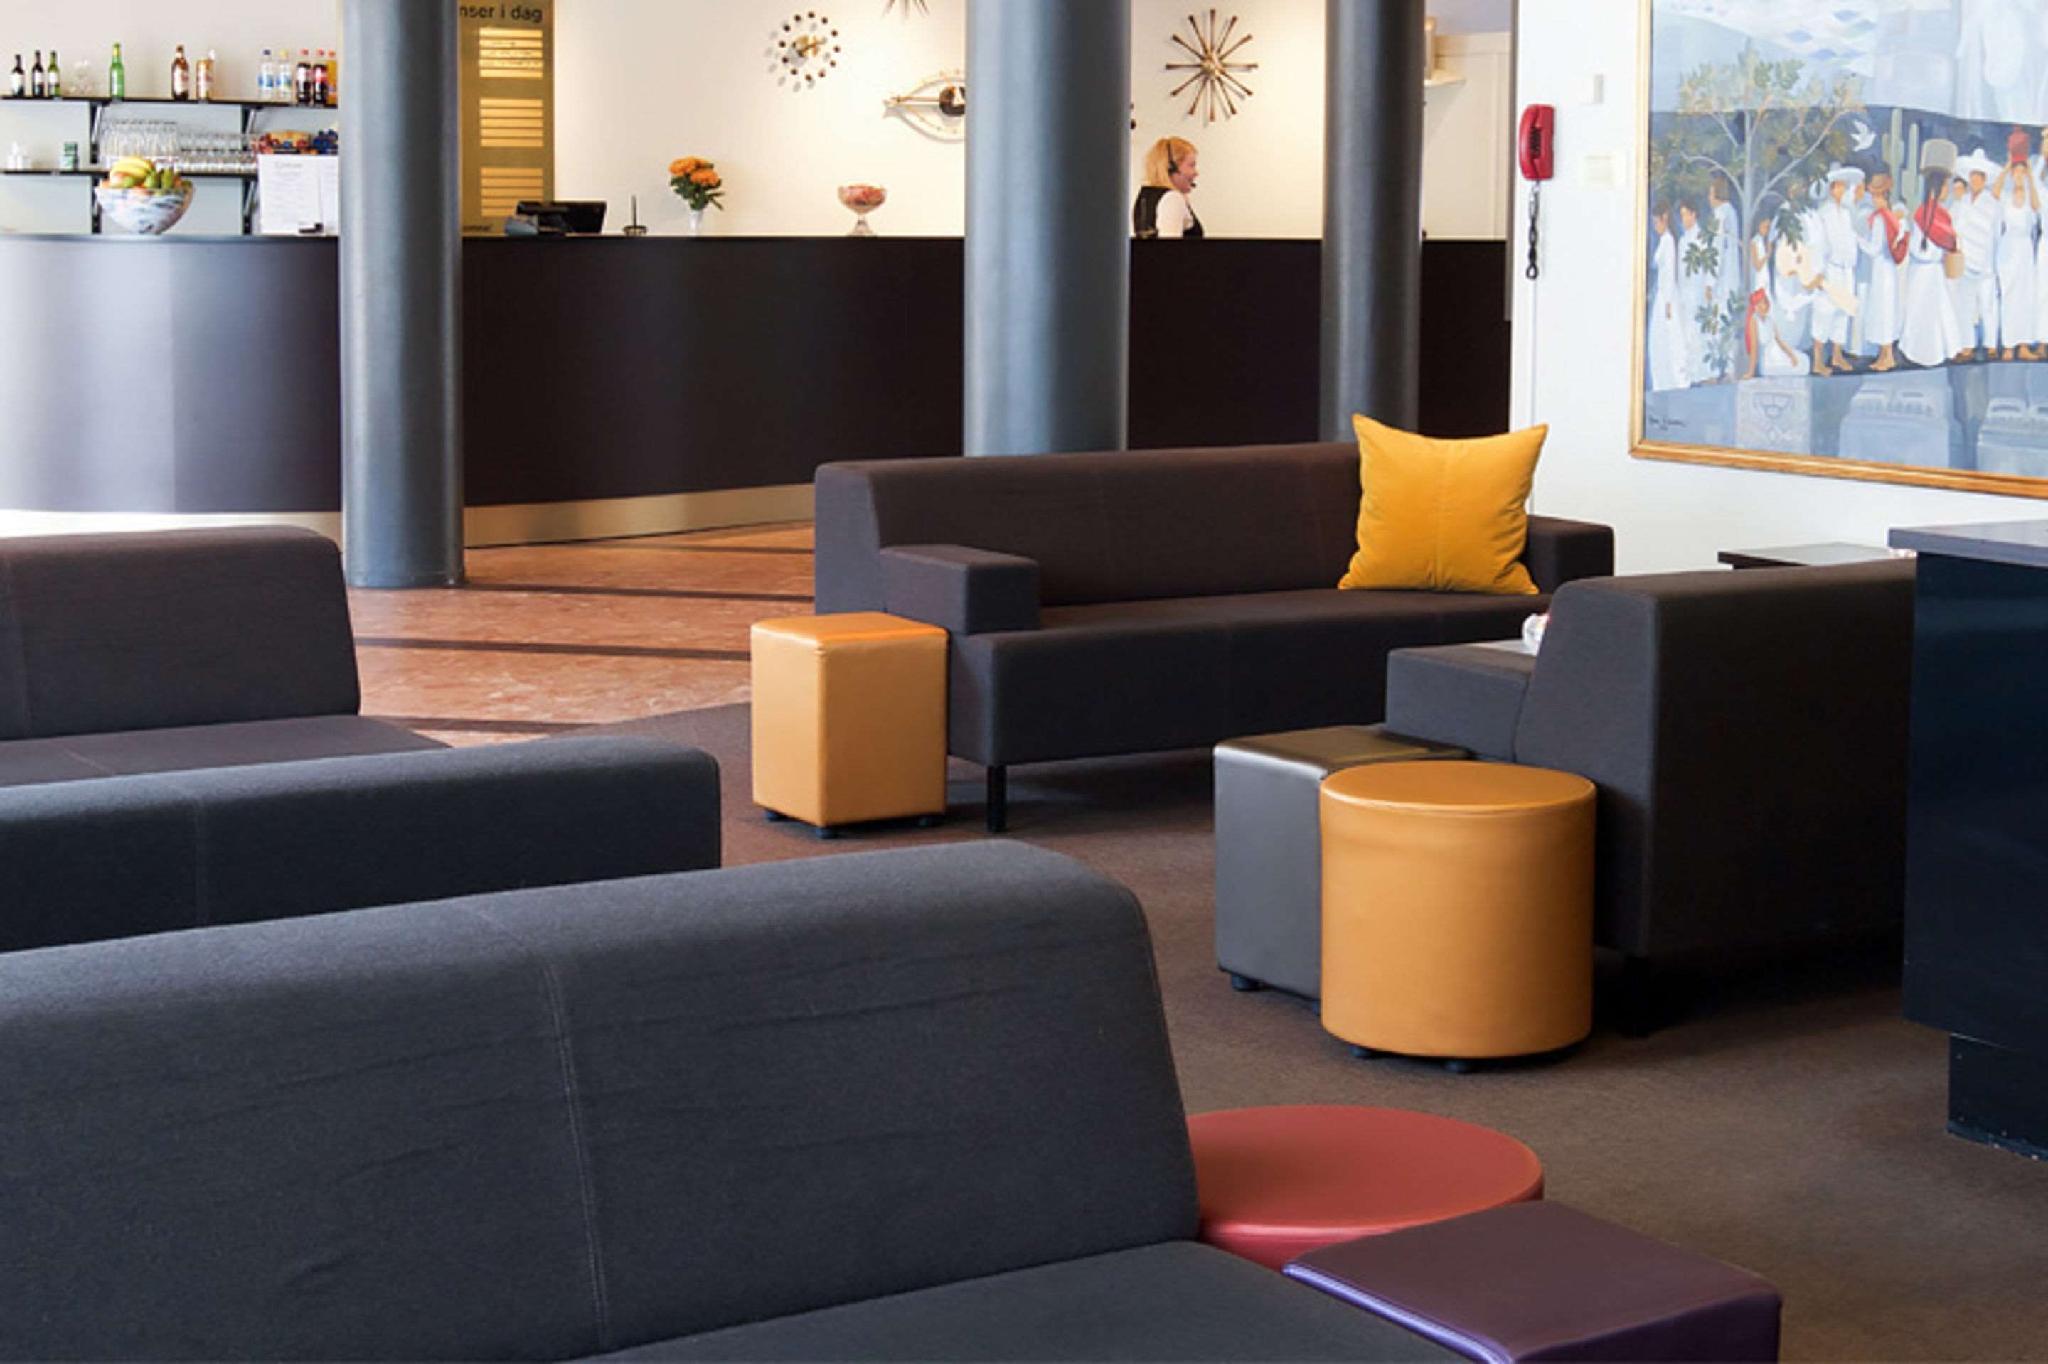 Quality Hotel Royal Corner, Växjö